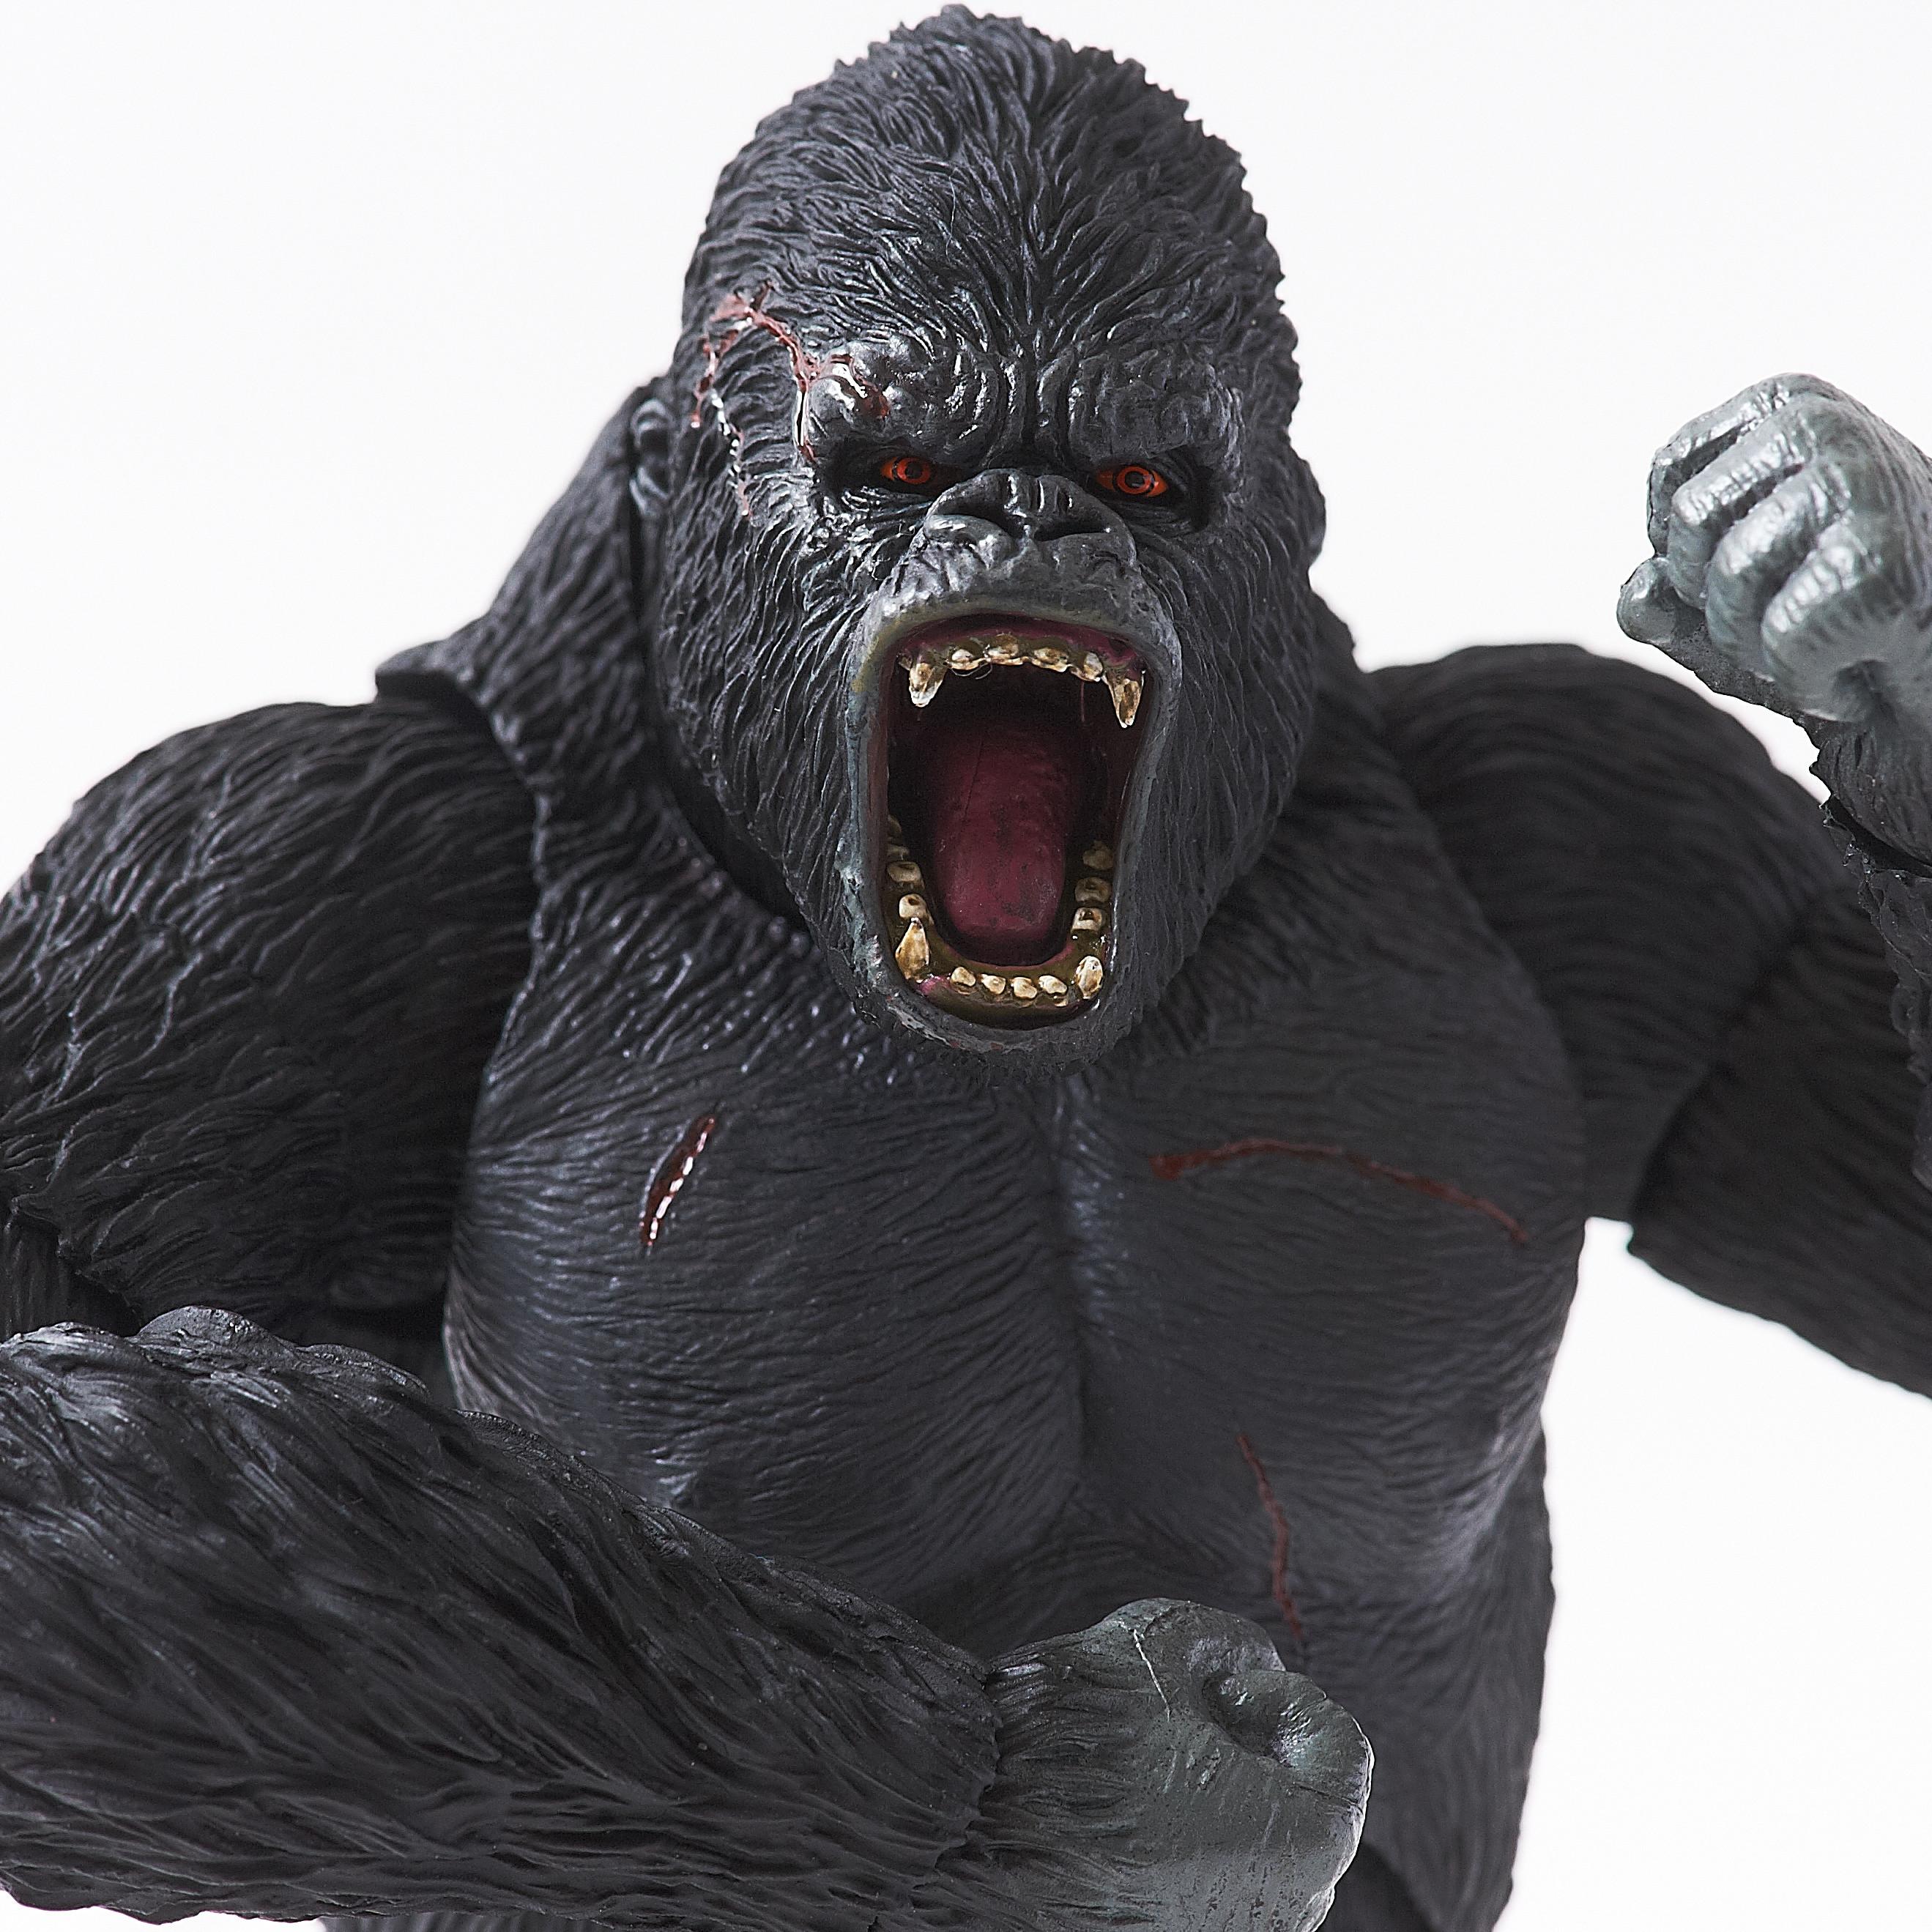 s h monsterarts king kong figure